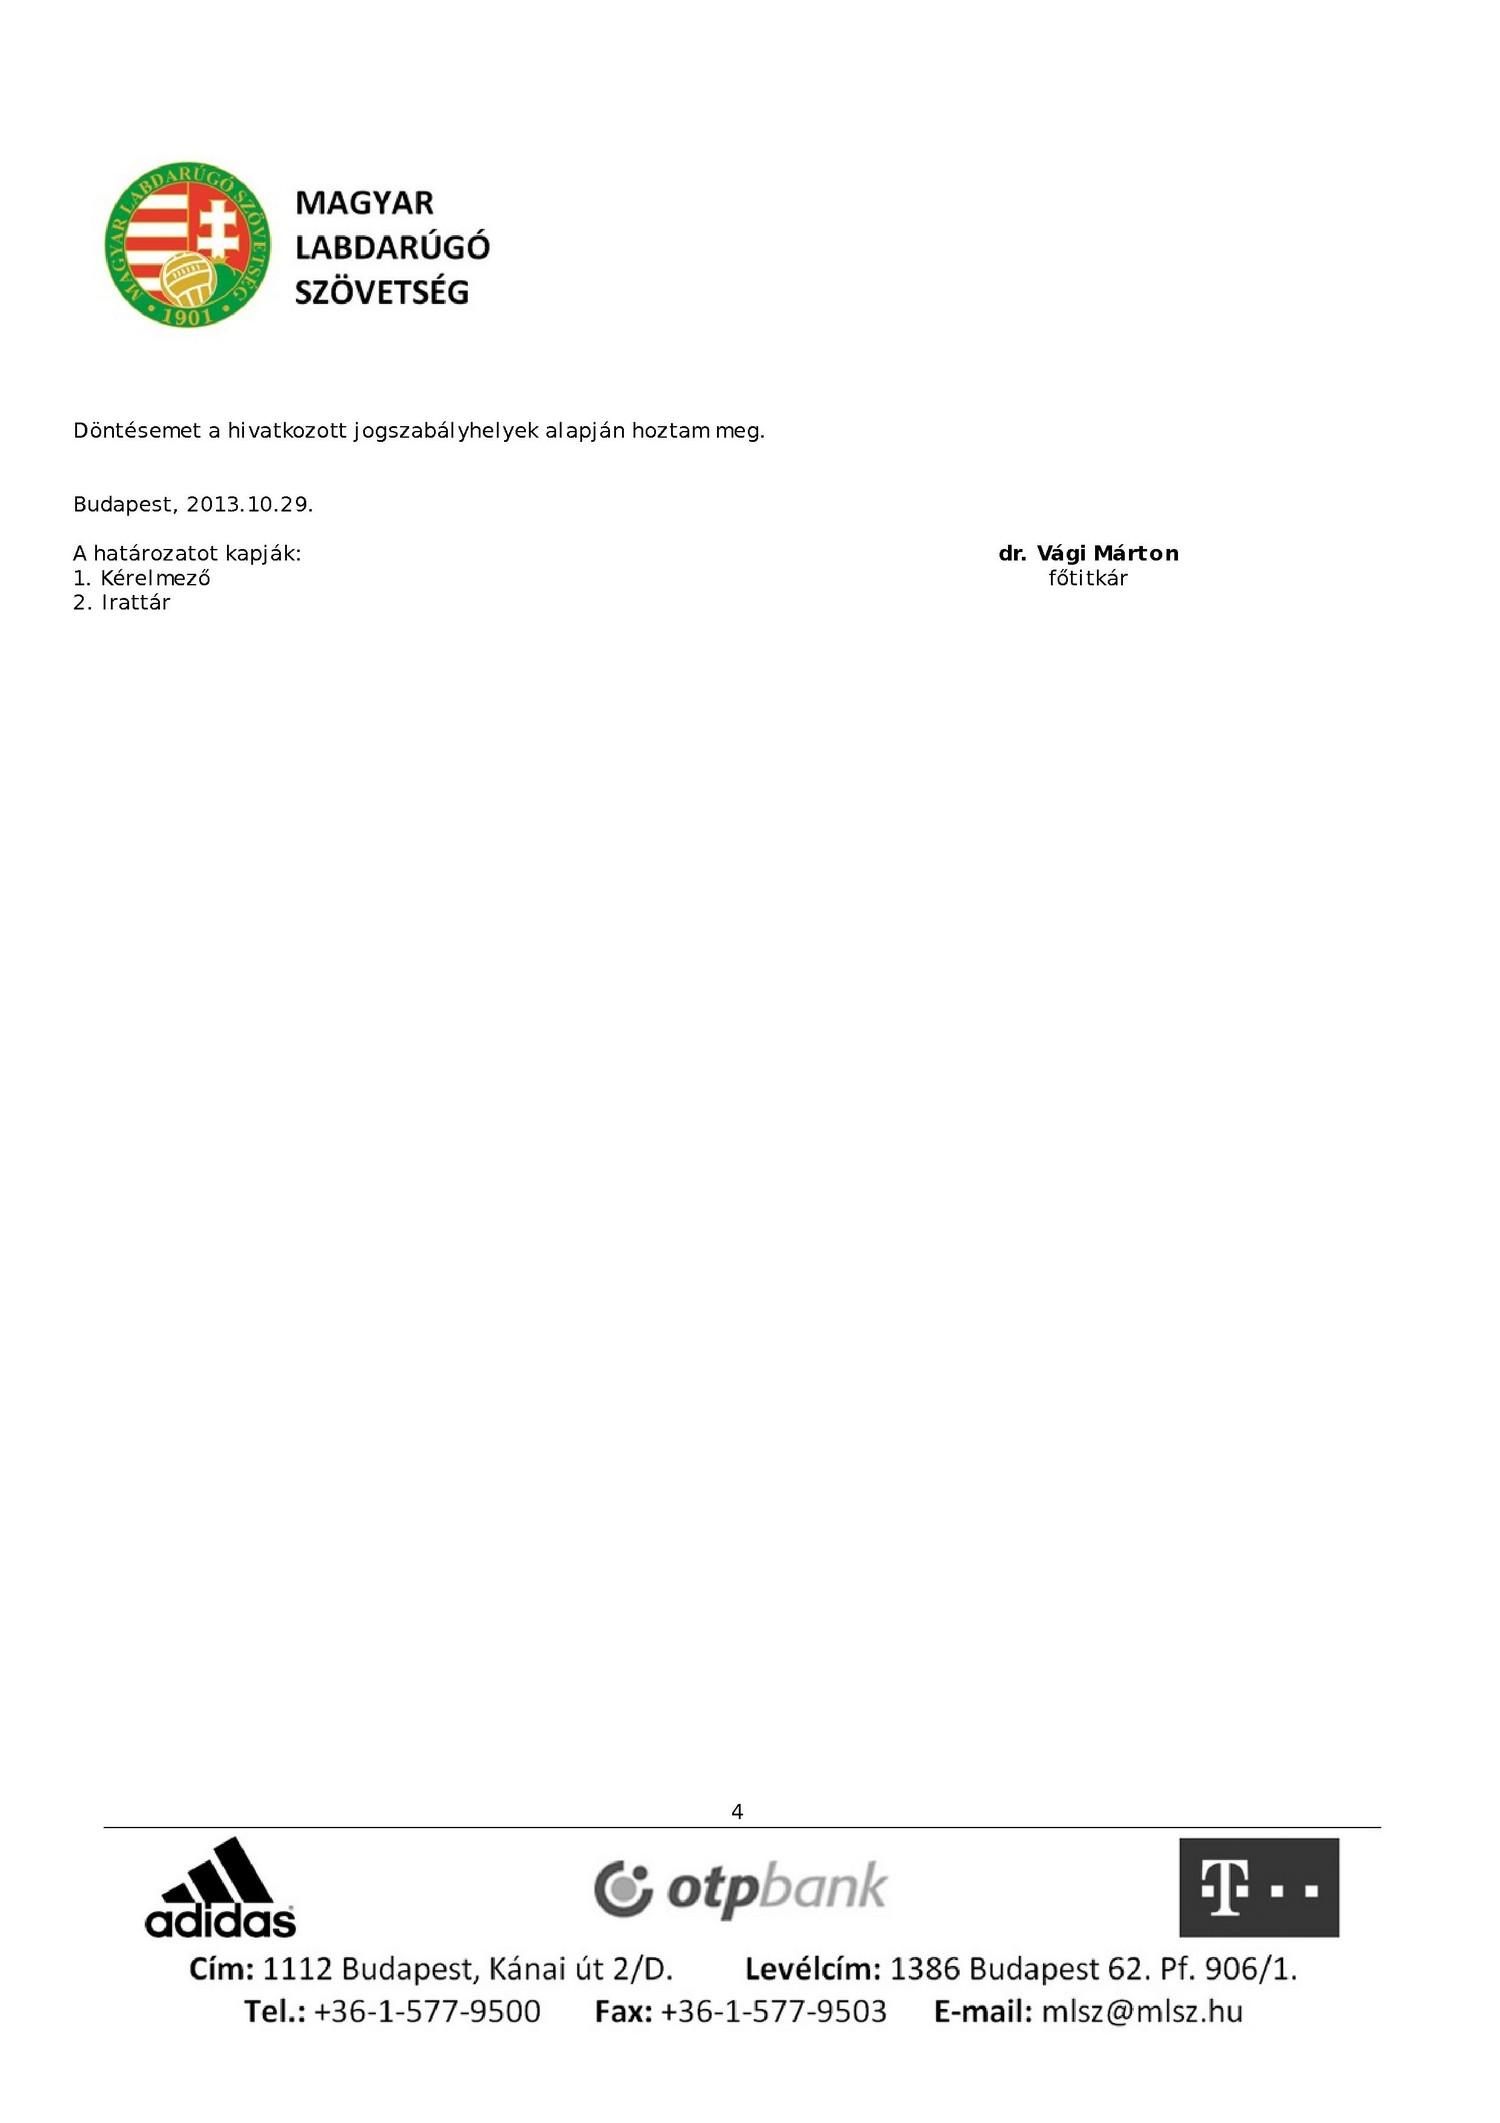 SFPHAT_3915_1_20131031_SIGNED-4